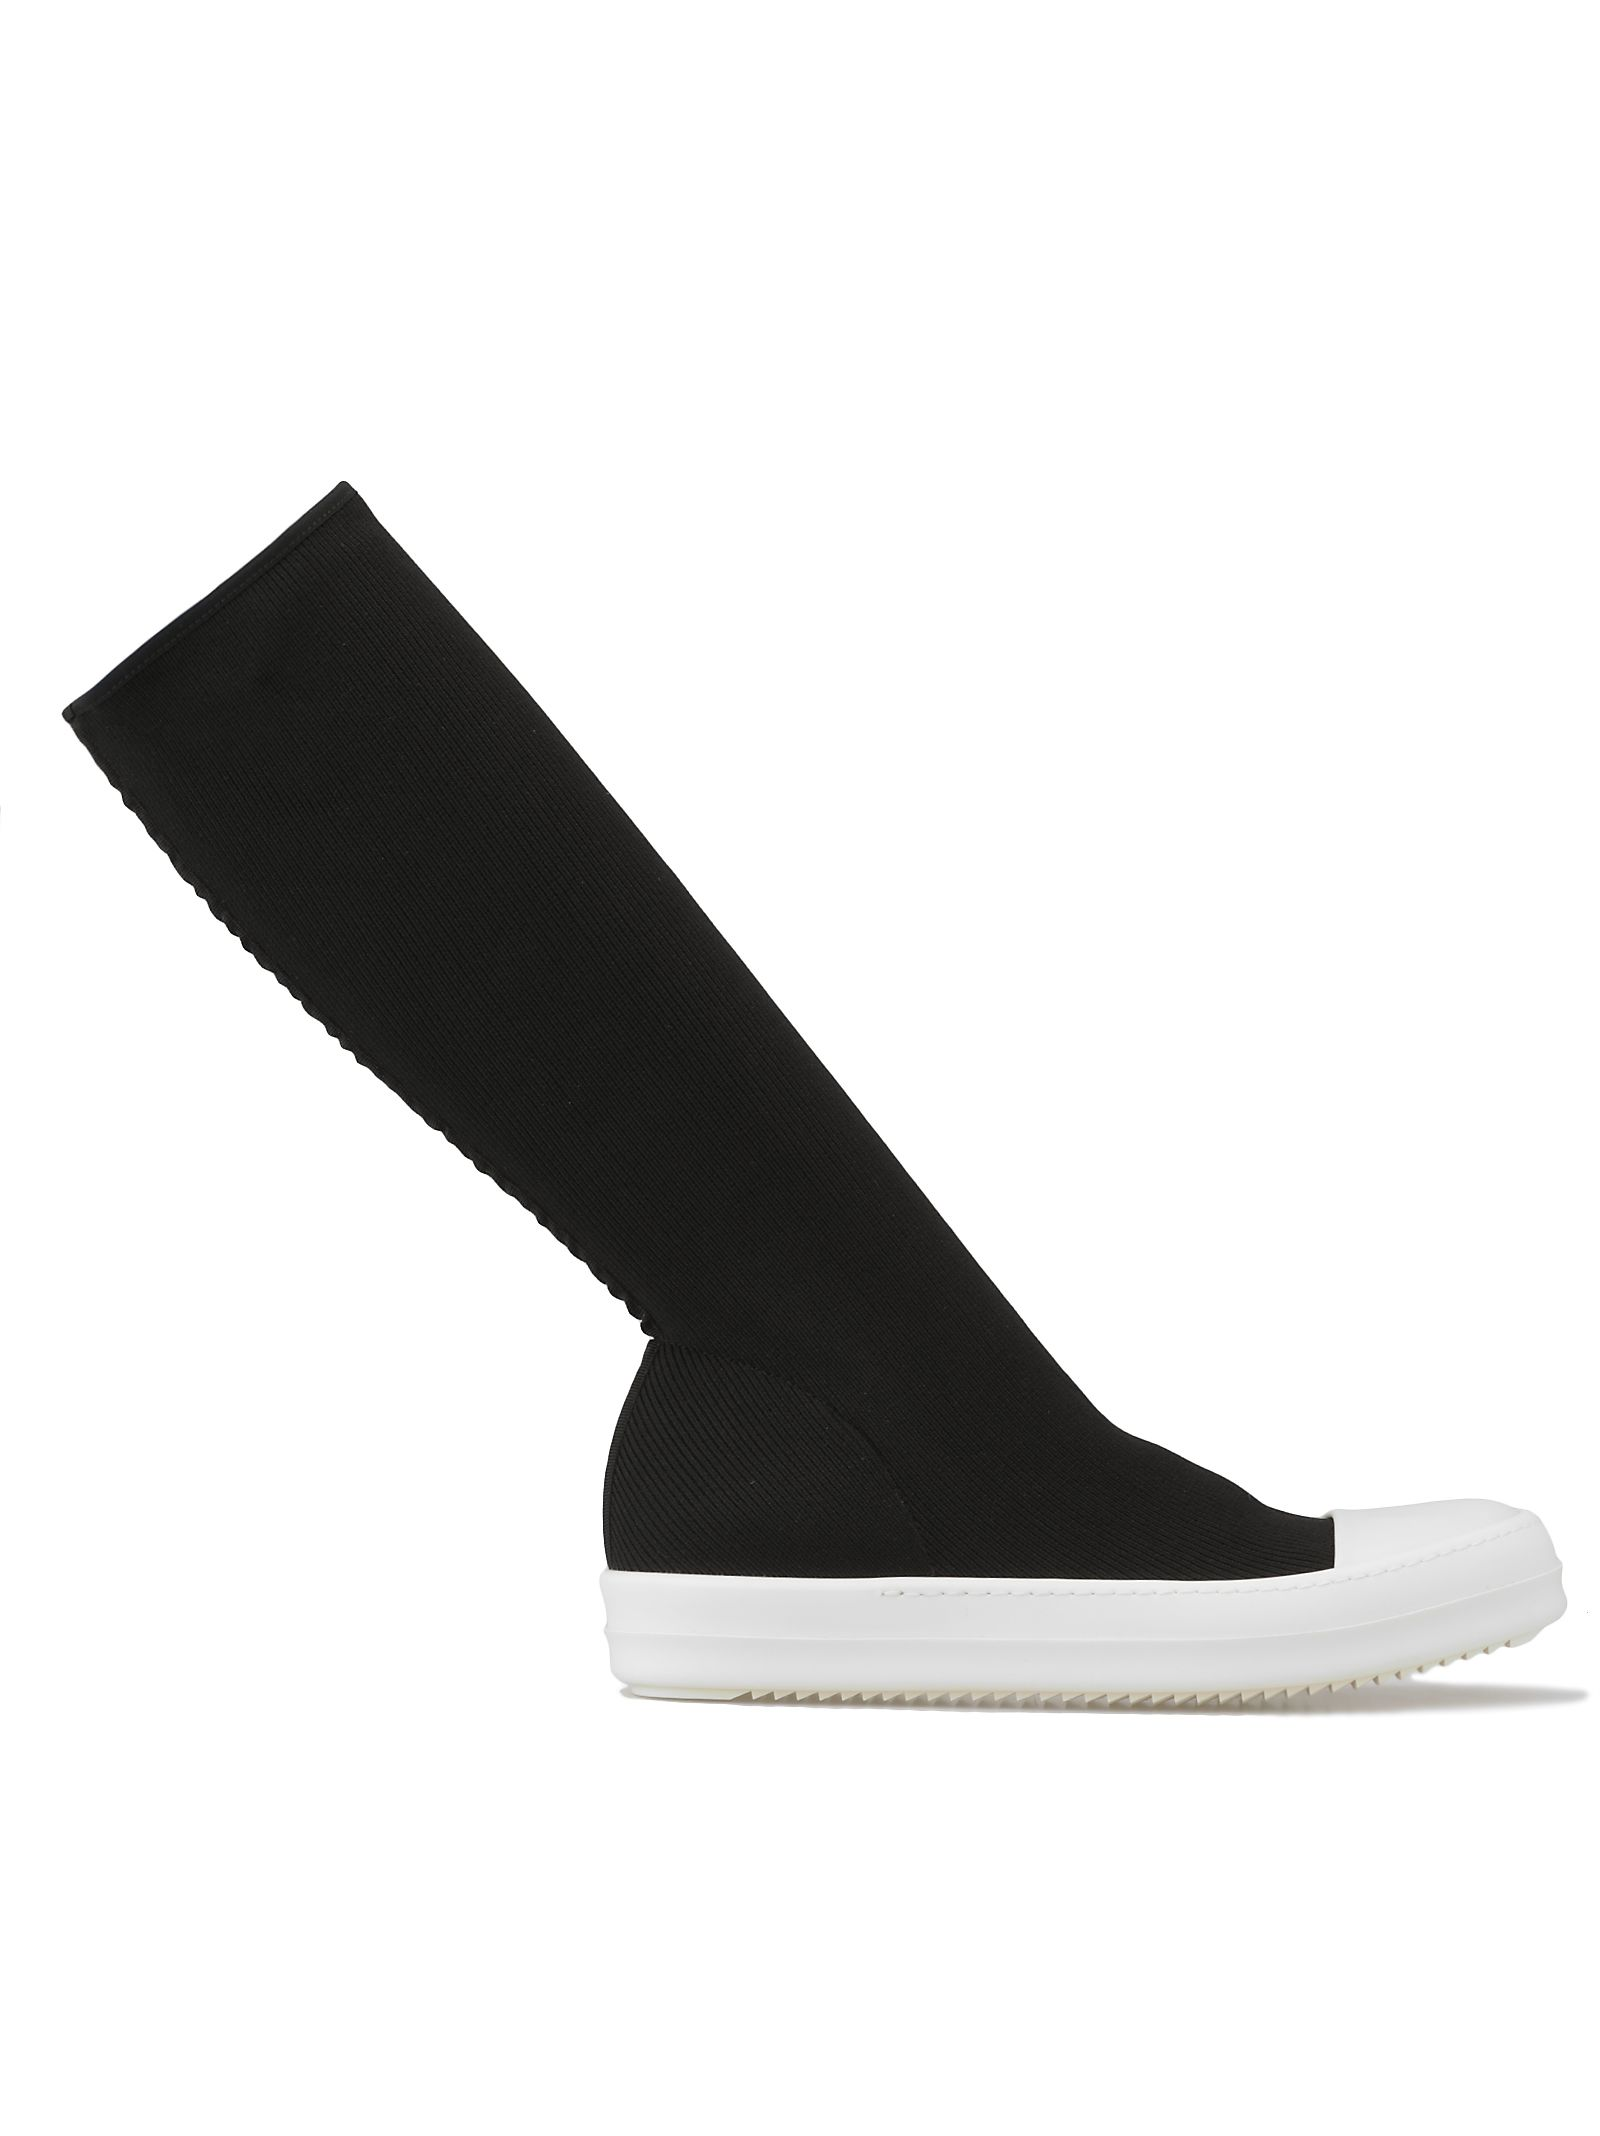 DRKSHDW Tech Fabric Boot in Black/Milk